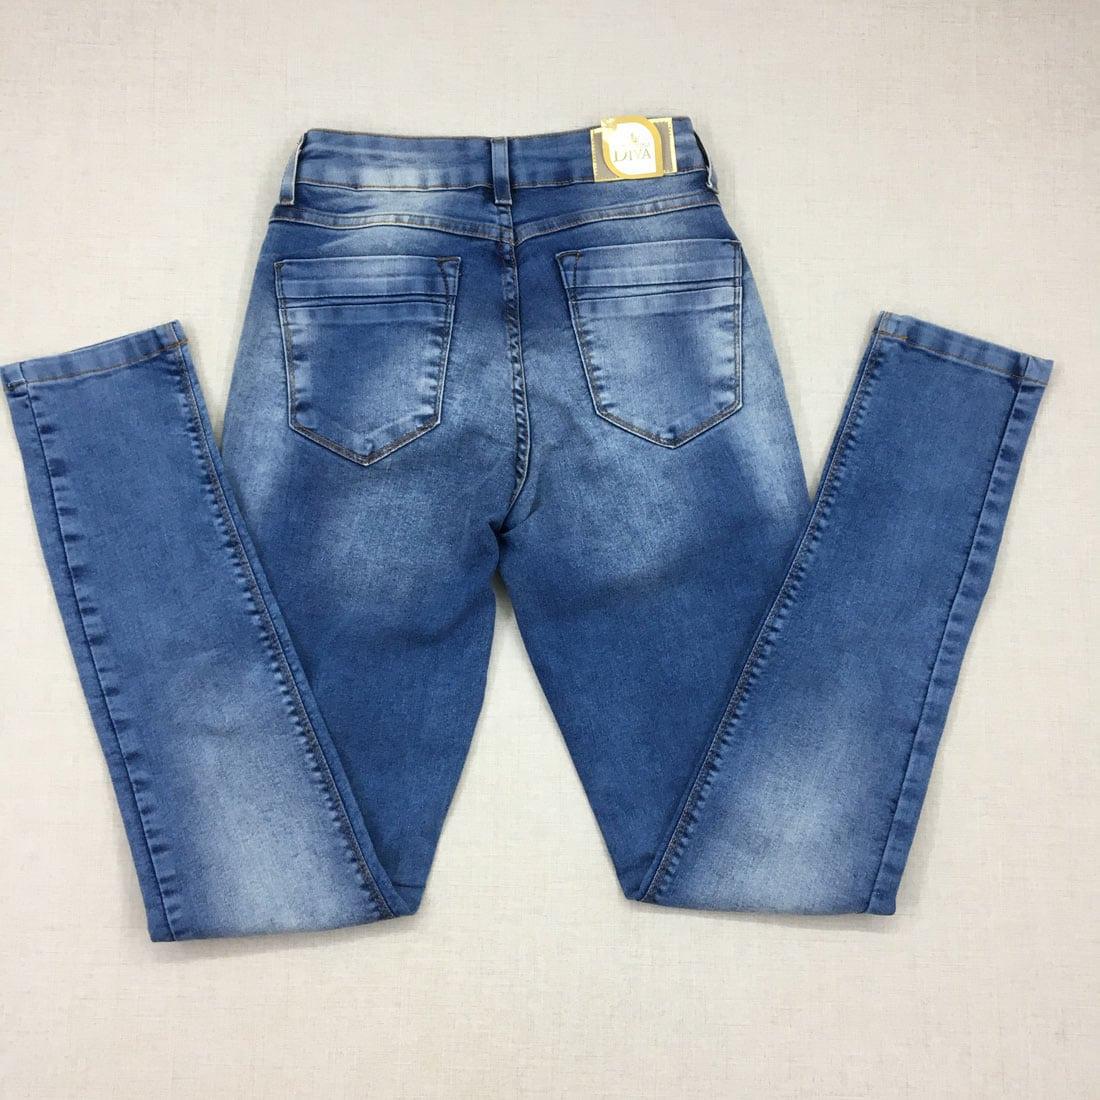 0d60cf983 divinadivamodafeminina.com.br calca jeans skinny azul claro manchado 1